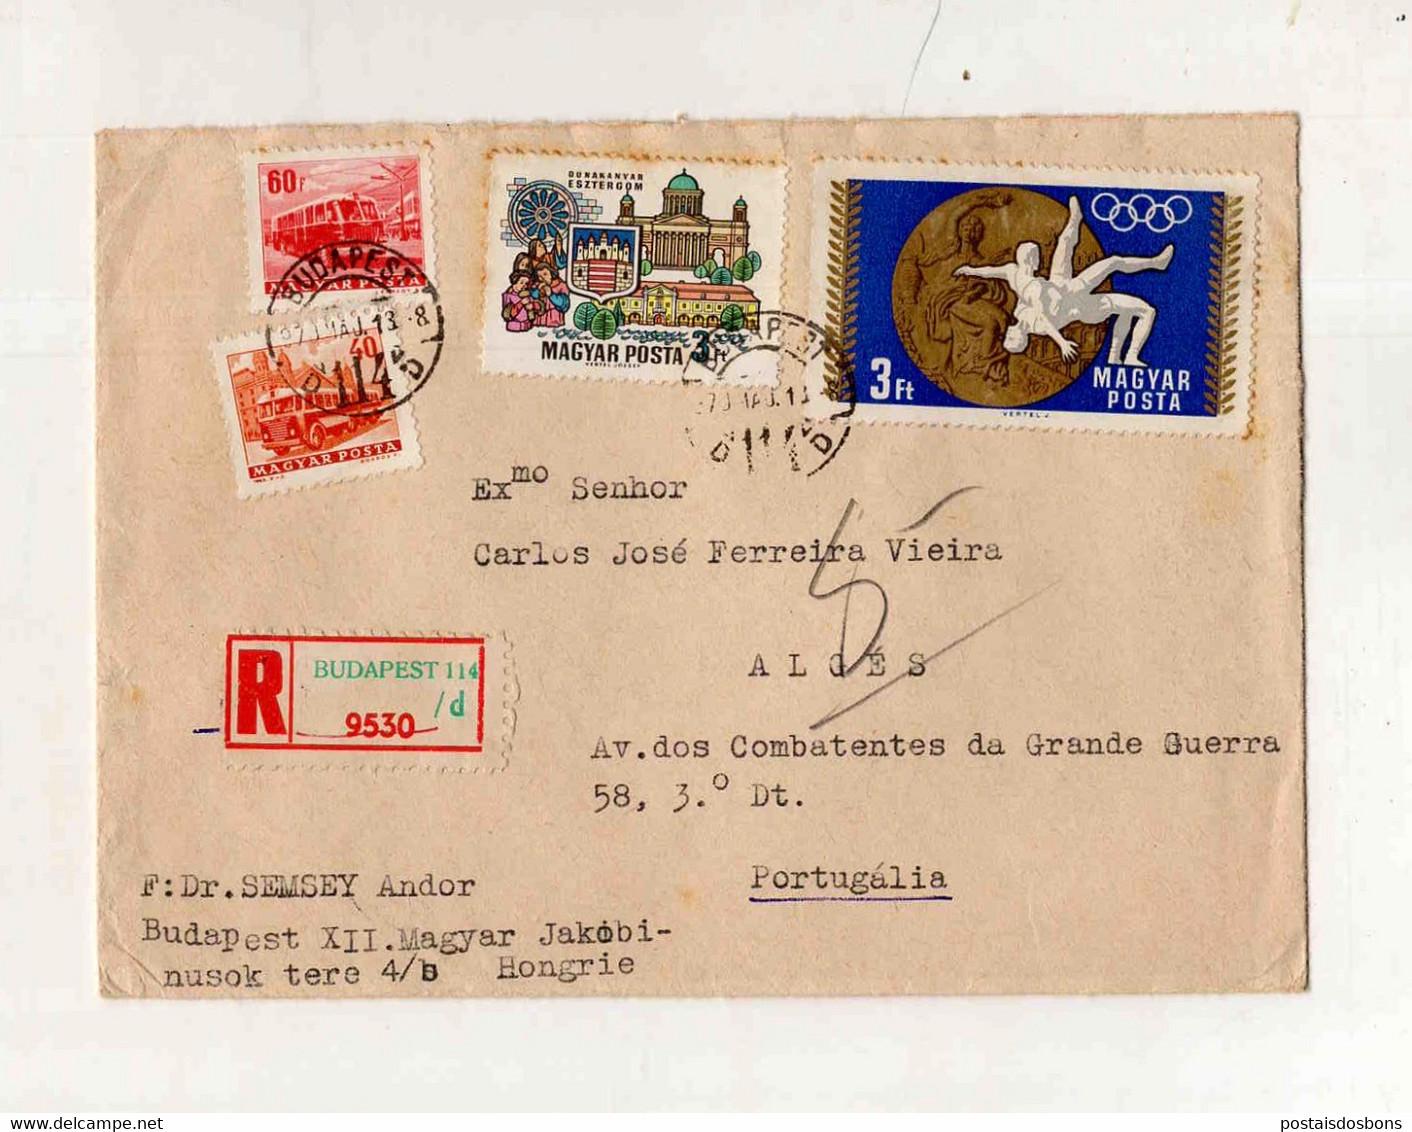 Cx15 57) Hongrie Hungary Magyar Posta 1970 Semsey Andor > Portugal Portugália Olimpia - Unclassified